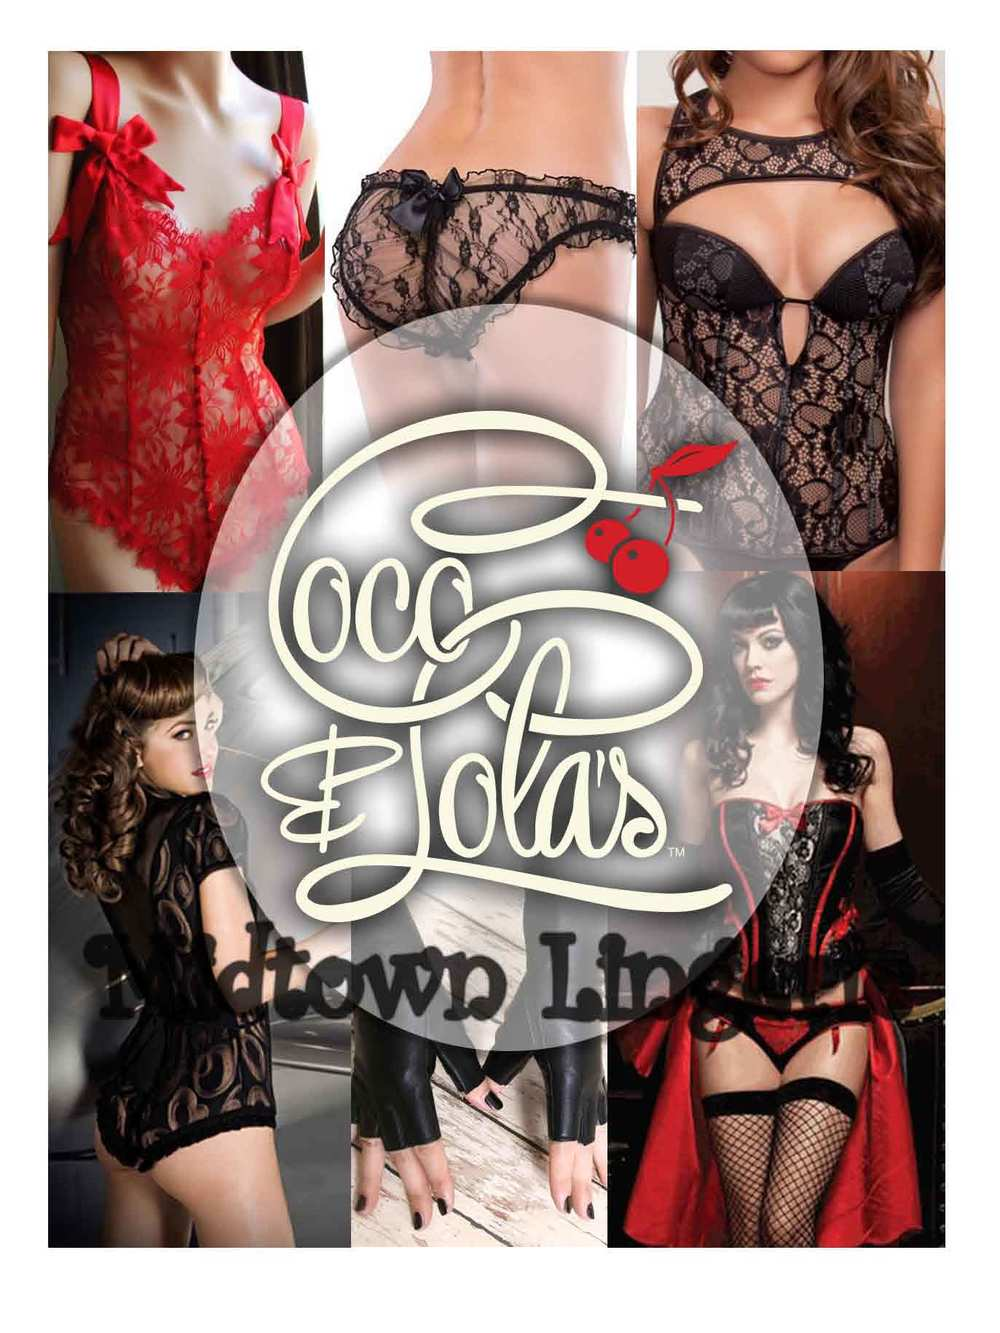 pic6-coco-lola-memphis-tn-lingerie.jpg